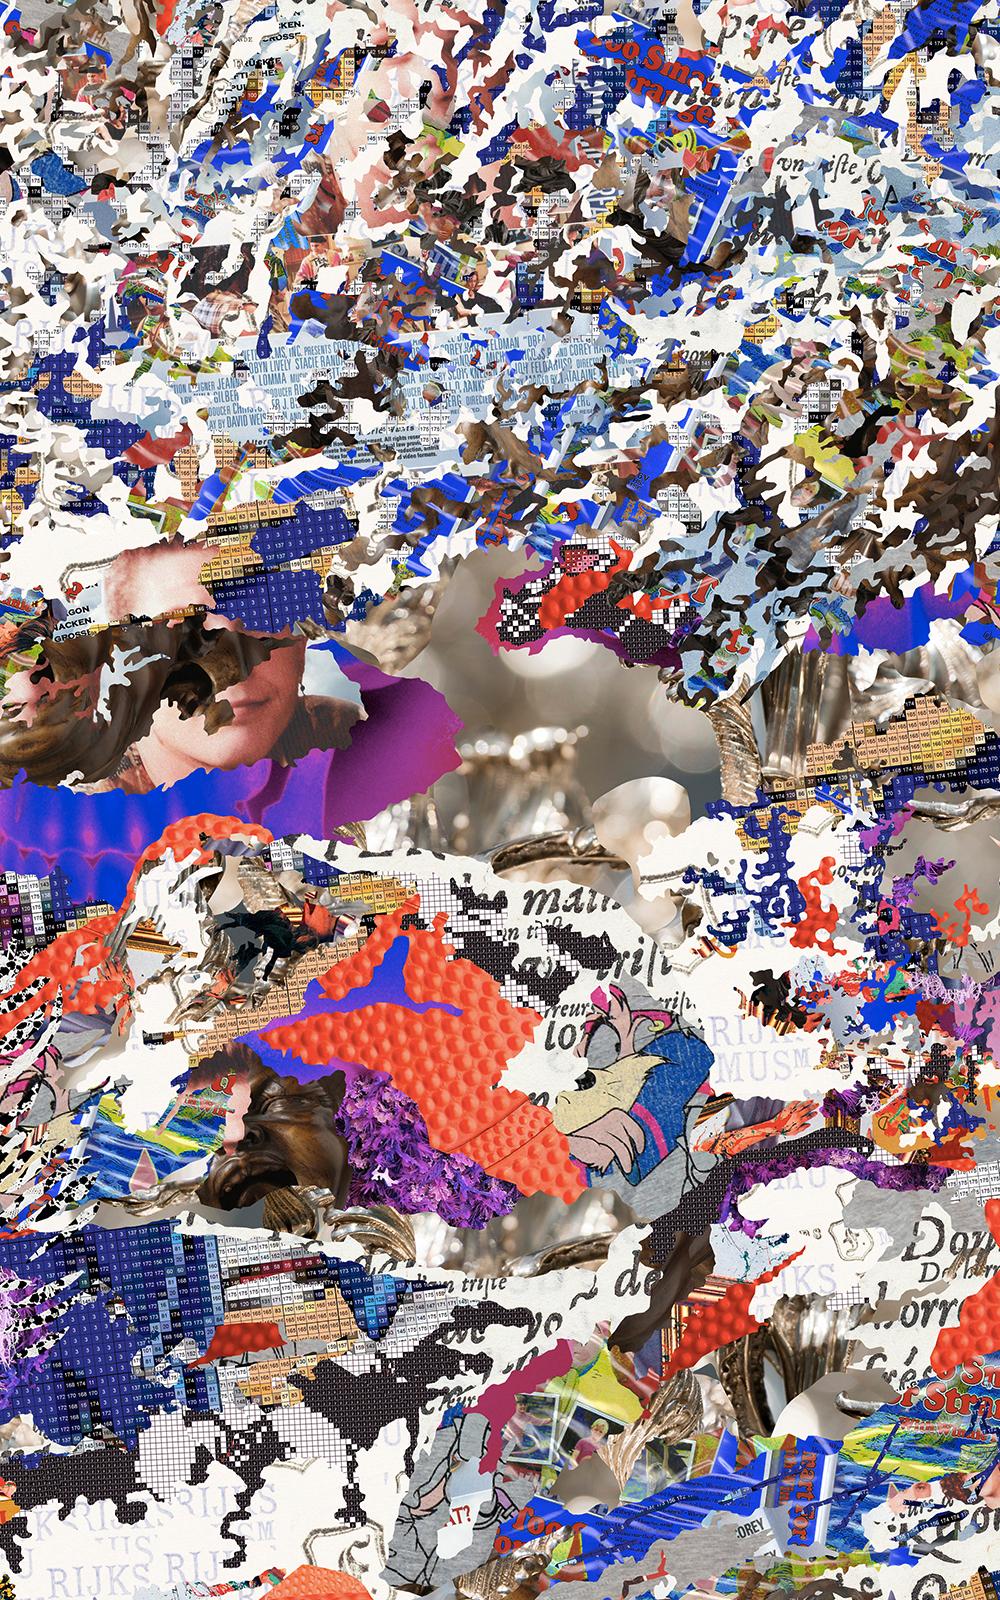 Case Simmons, Simmons & Burke, Blue JuJu, Dutchmasters, Kohn Gallery,Pigment Print, Digital Collage,Digital Art, Photoshop Collage, Contemporary Collage, Photoshop Actions, Case Simmons Art, Collage Fine Art, Digital Landscape